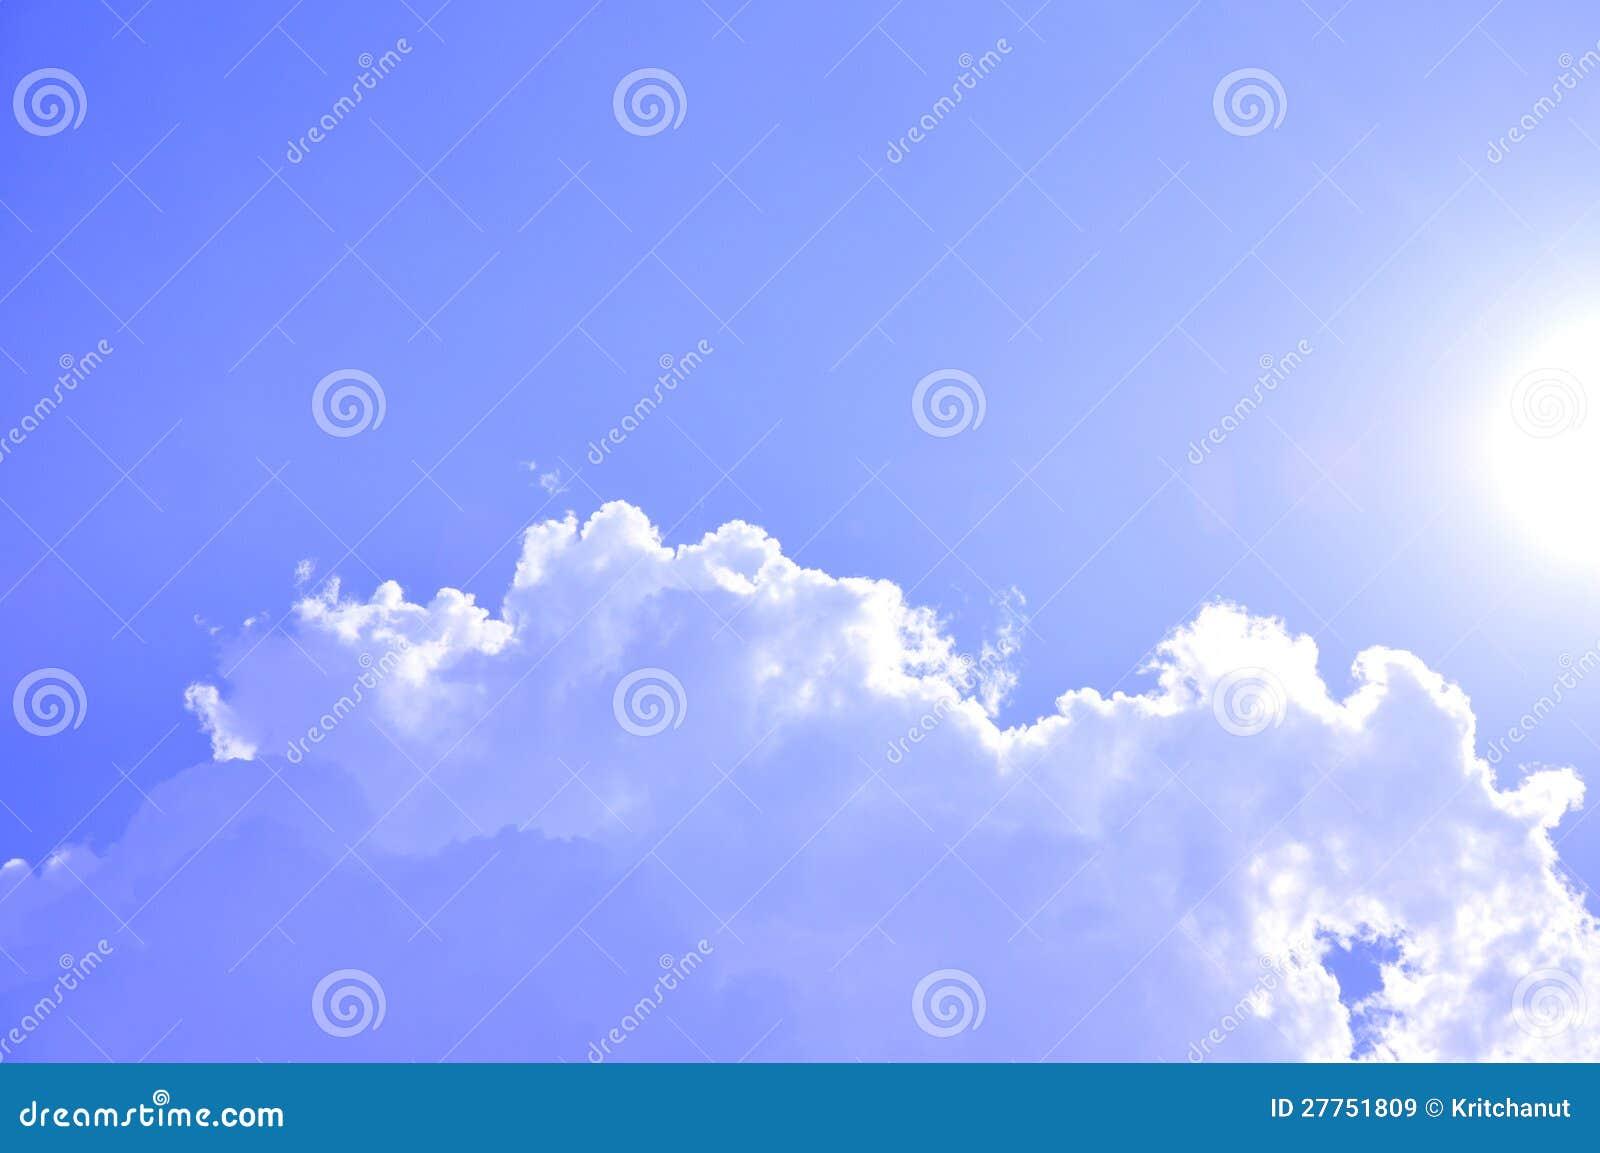 Ciel ensoleillé